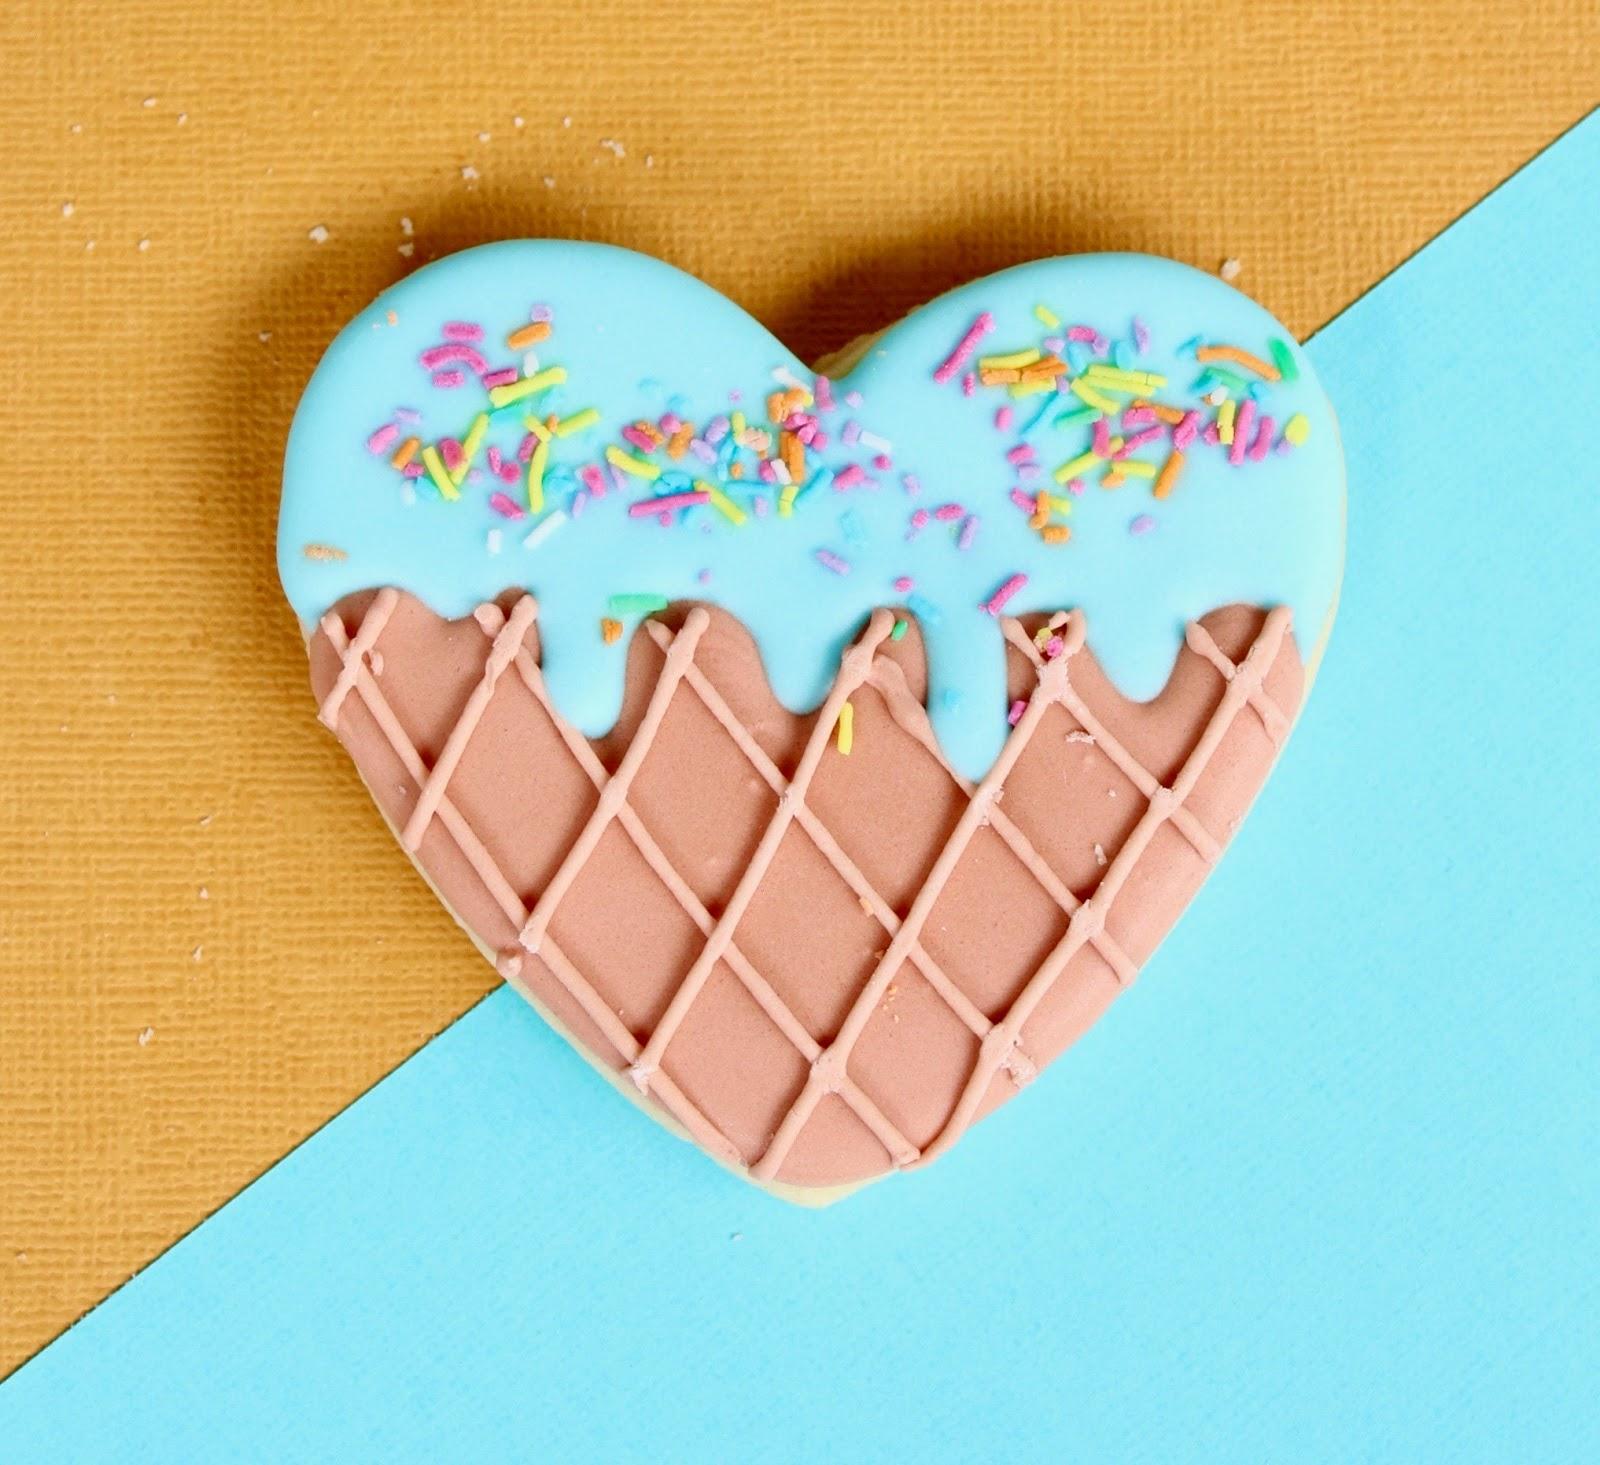 Chocolate Love DP 2019